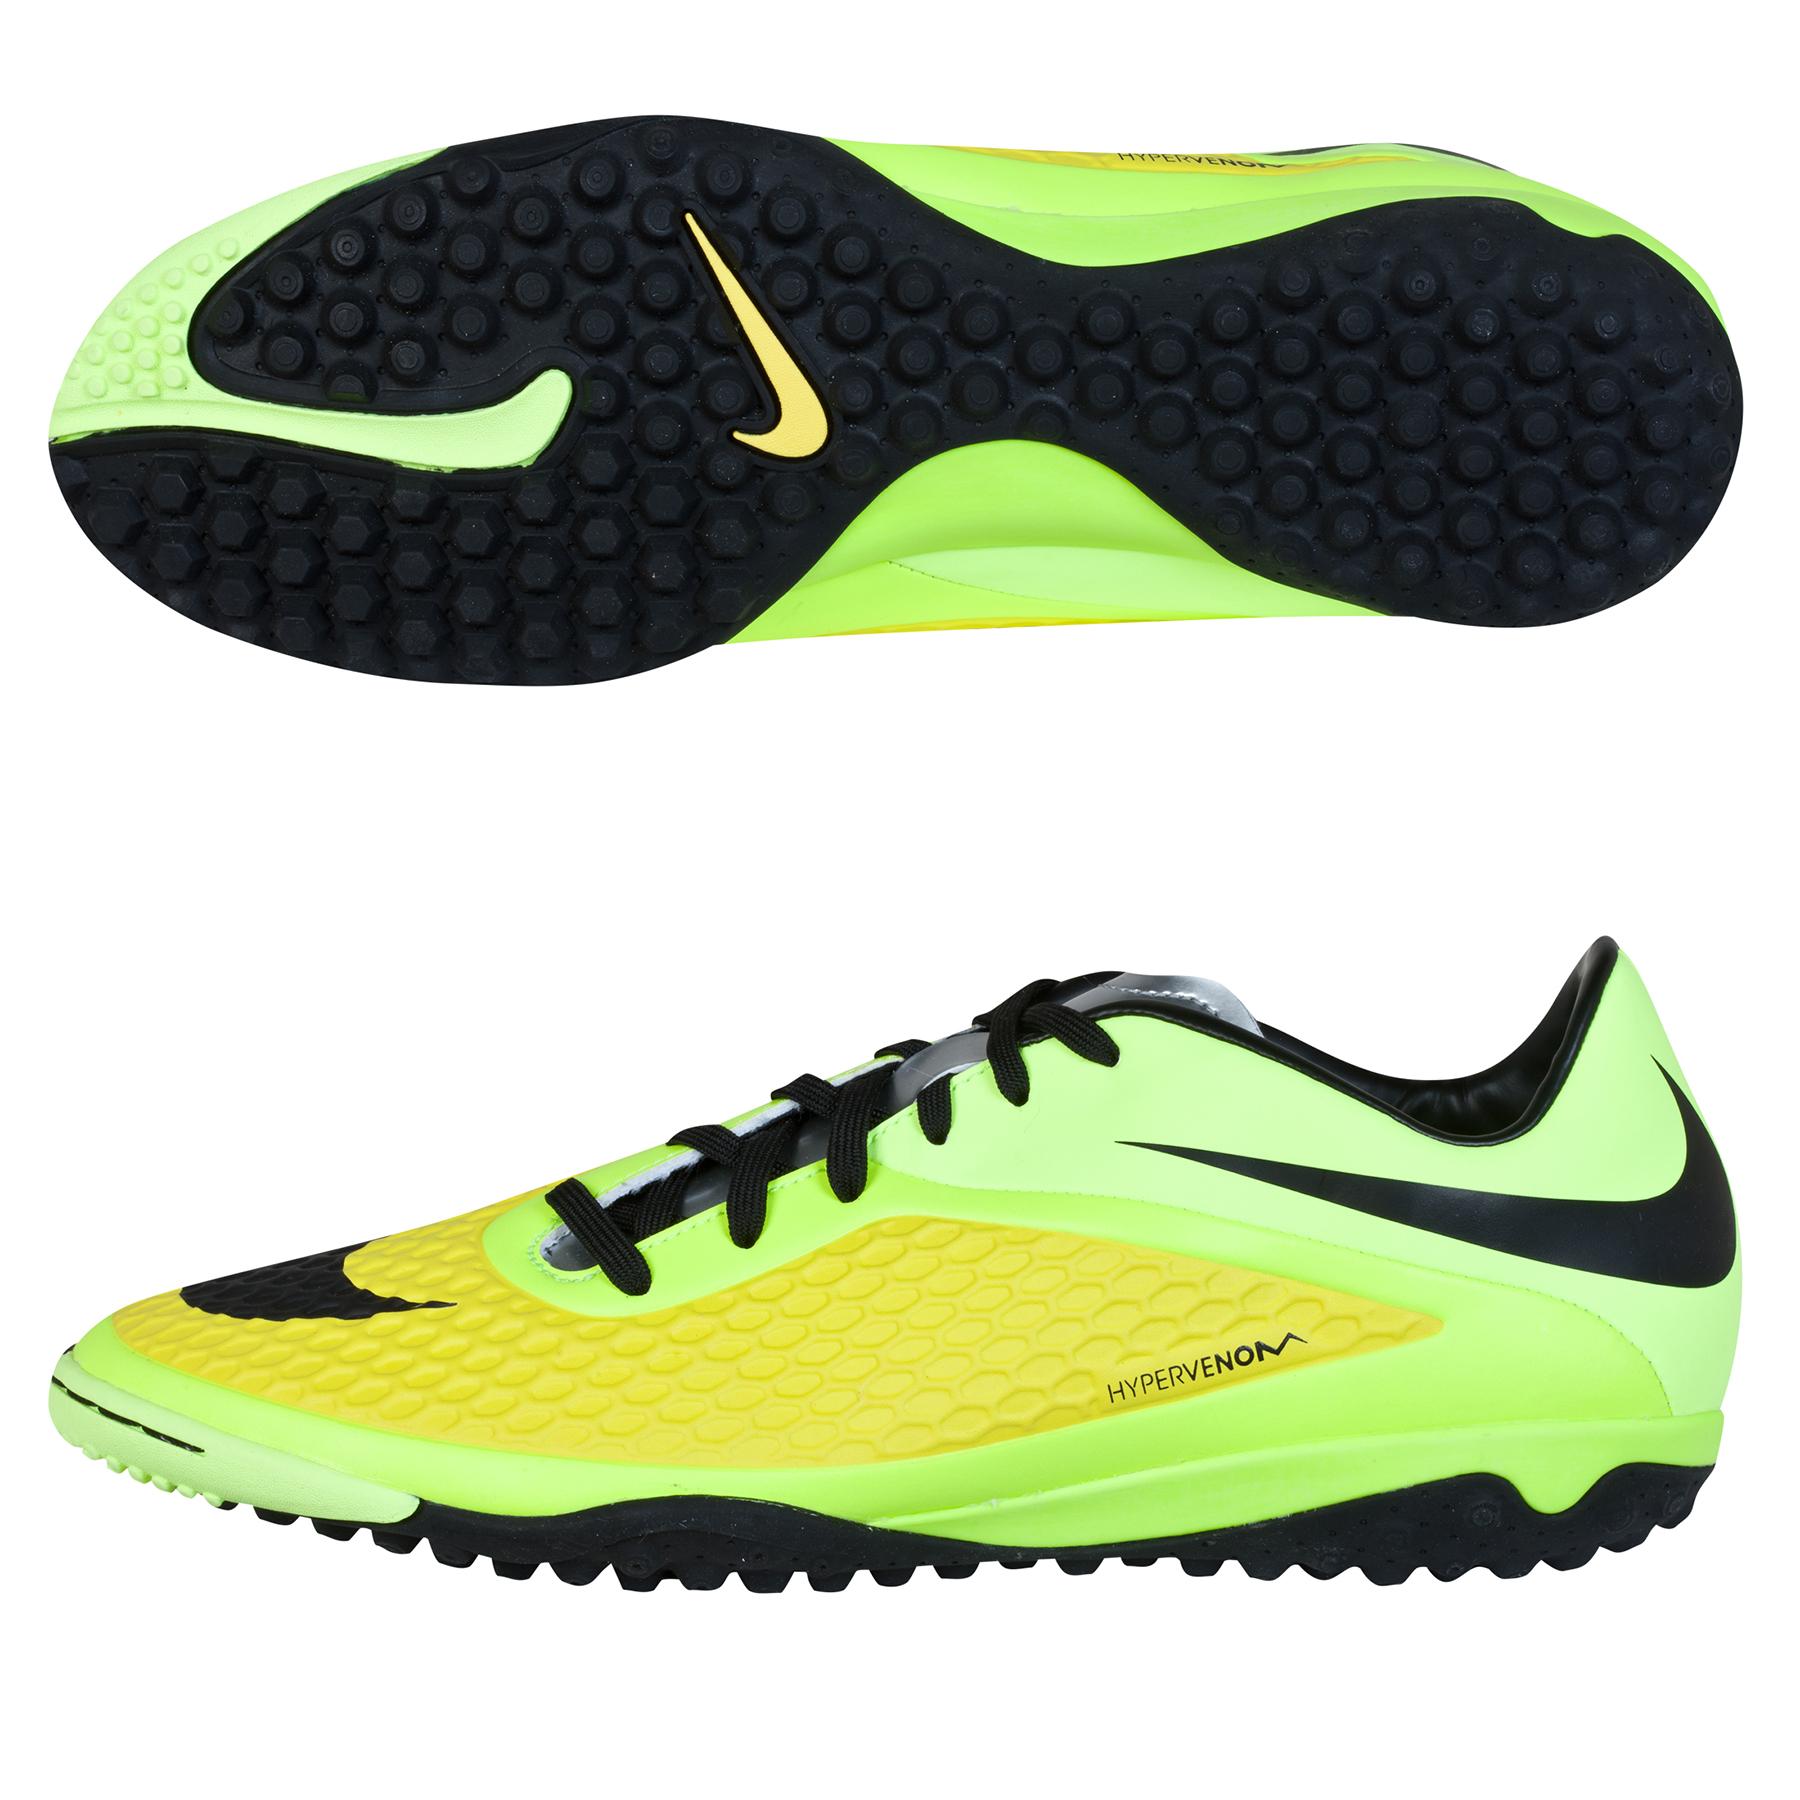 Nike Hypervenom Phade Astroturf Yellow